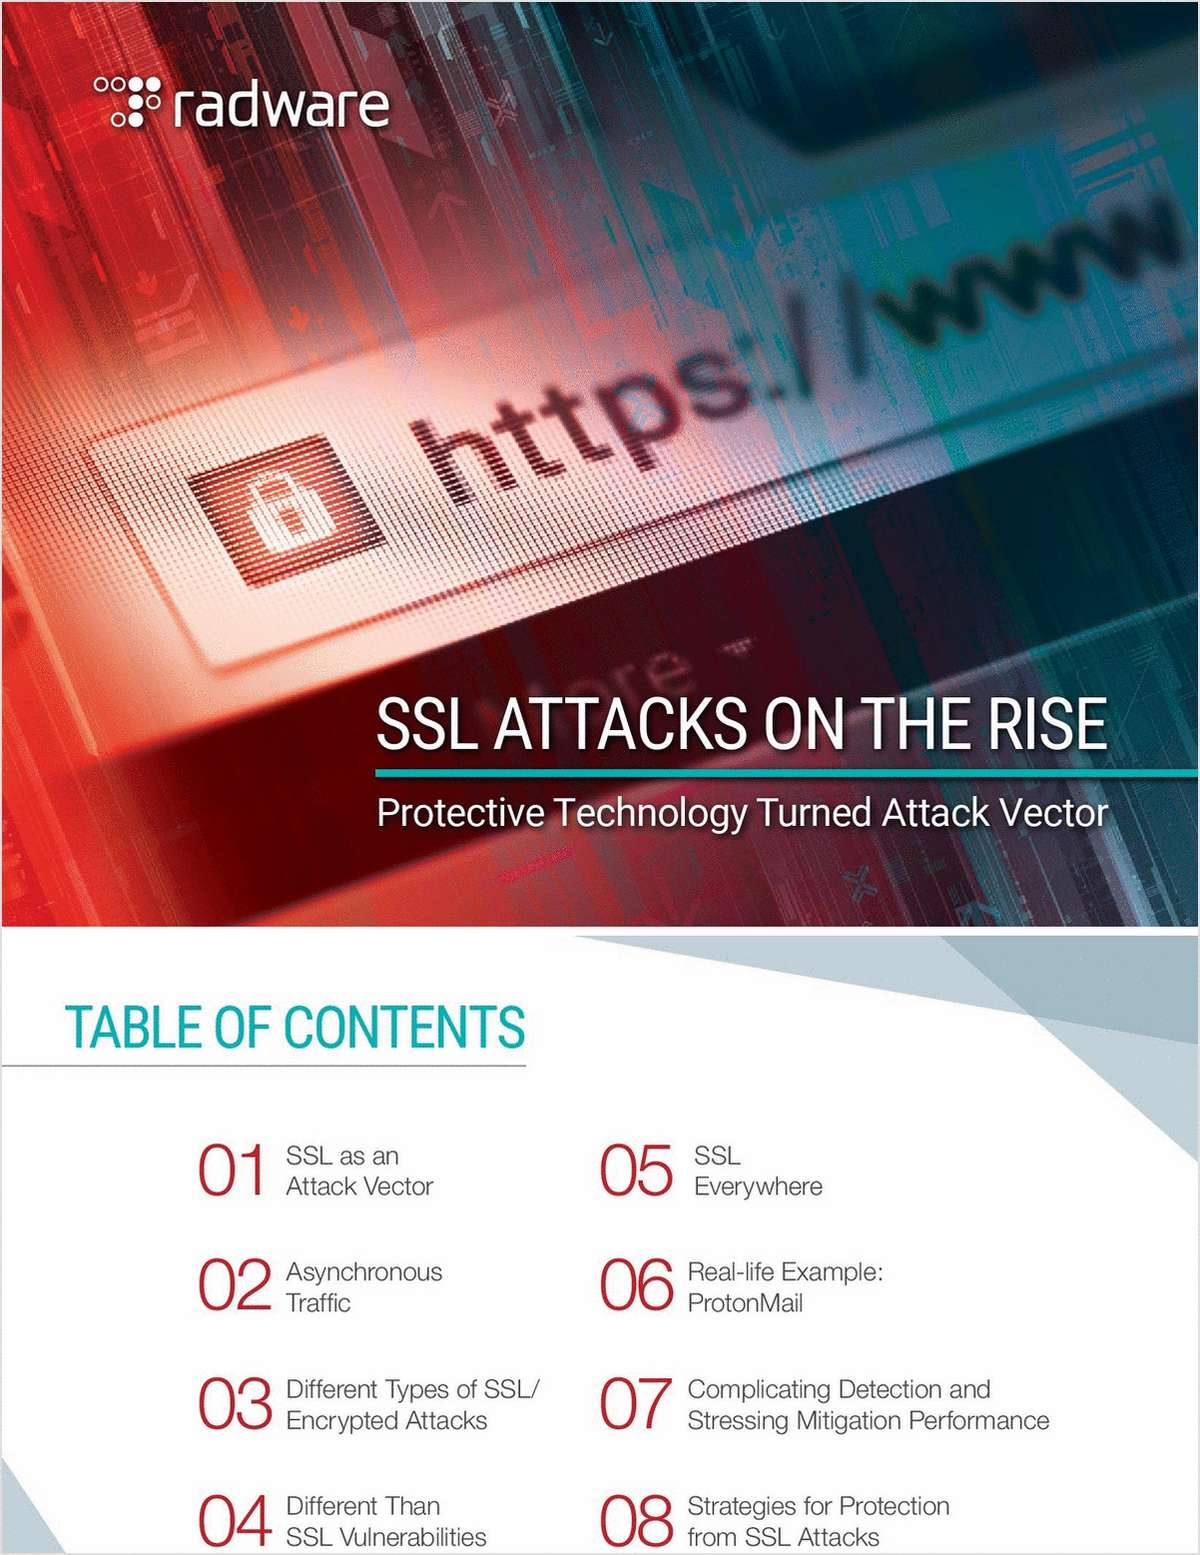 SSL Attacks on the Rise